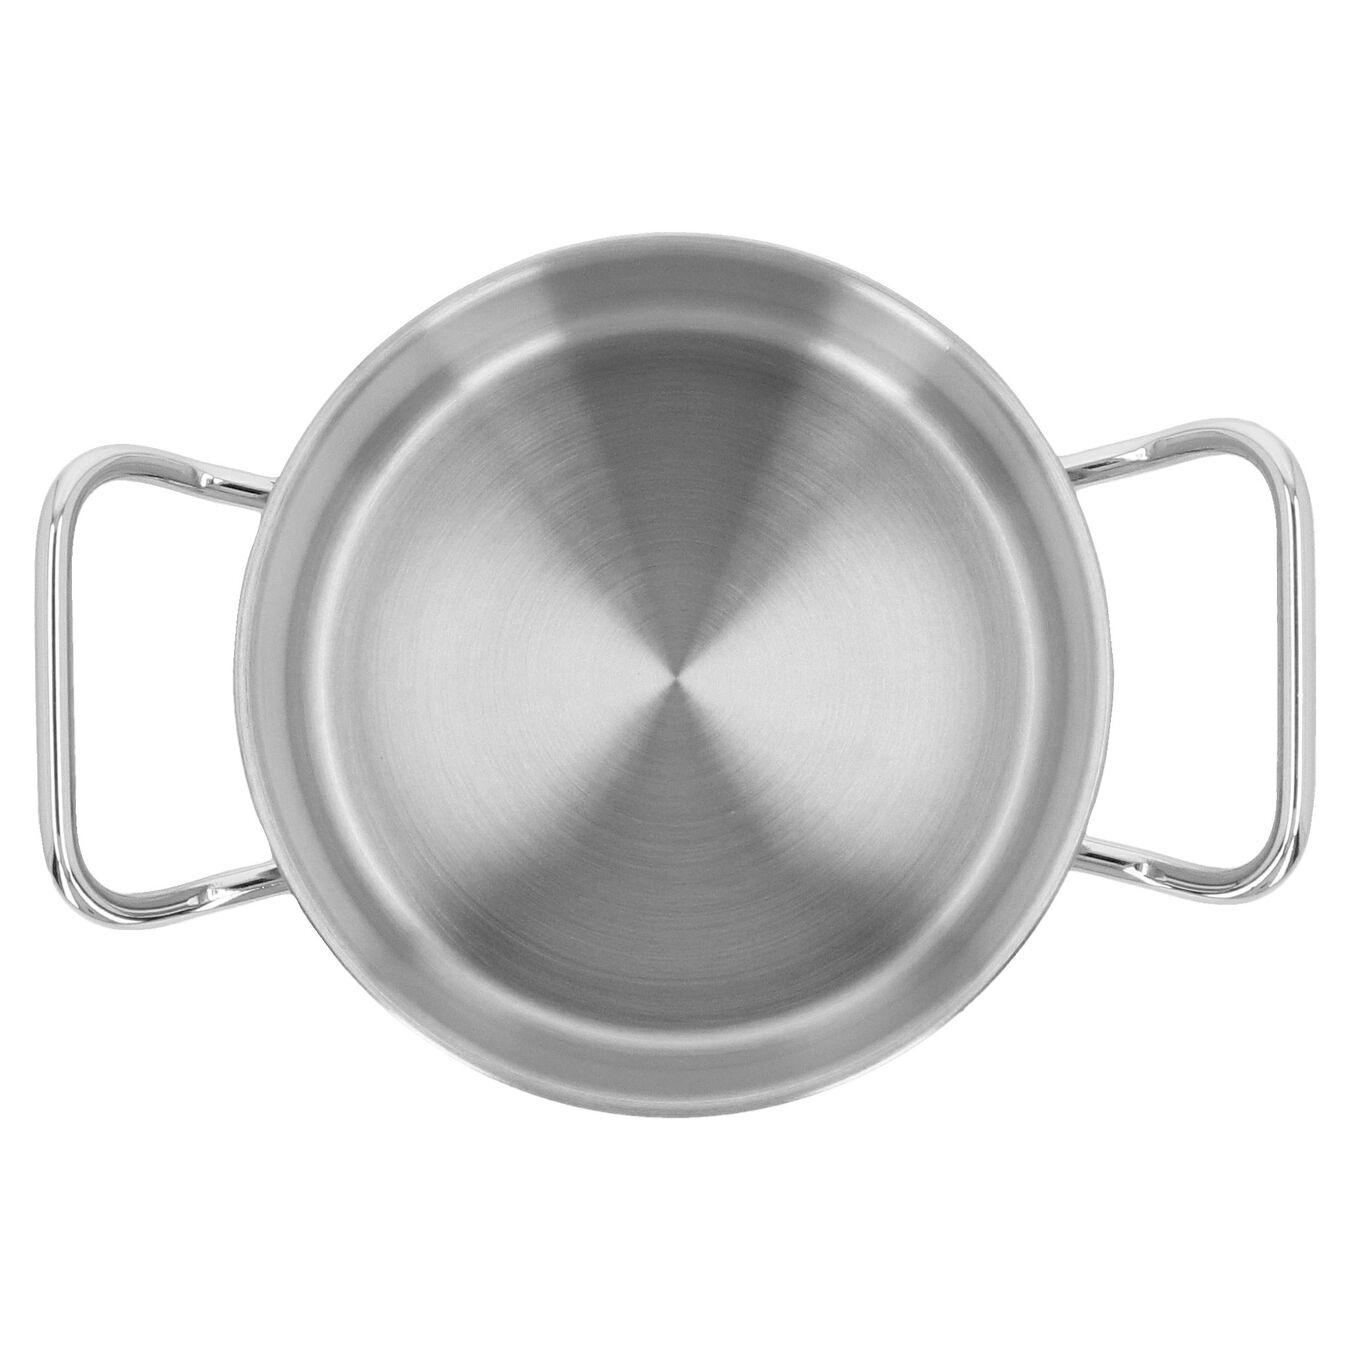 Kookpot met deksel 16 cm / 1,5 l,,large 3